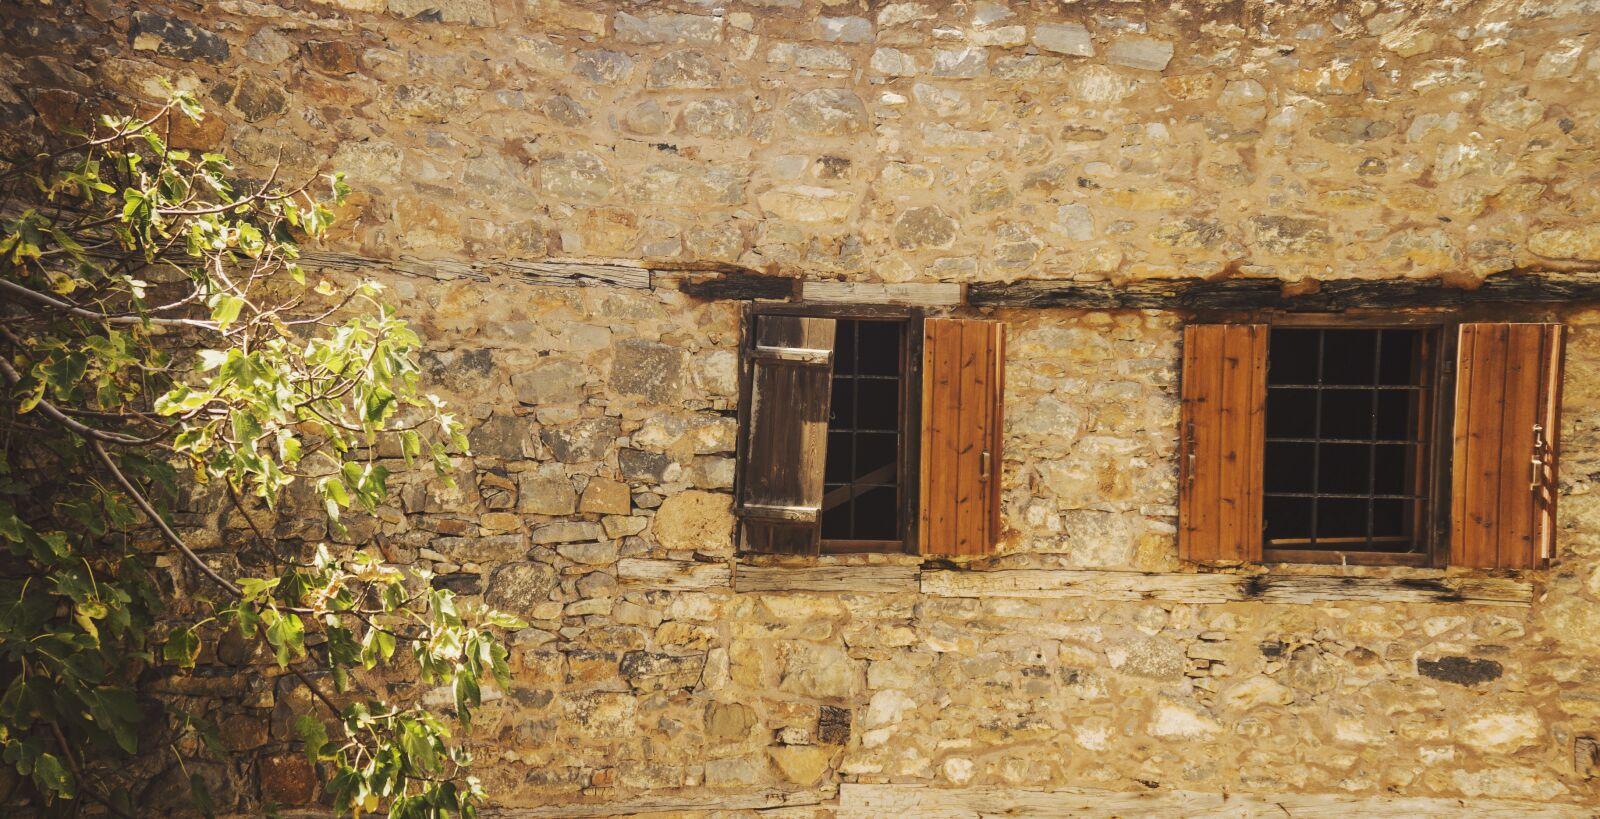 spinalonga, wall, old